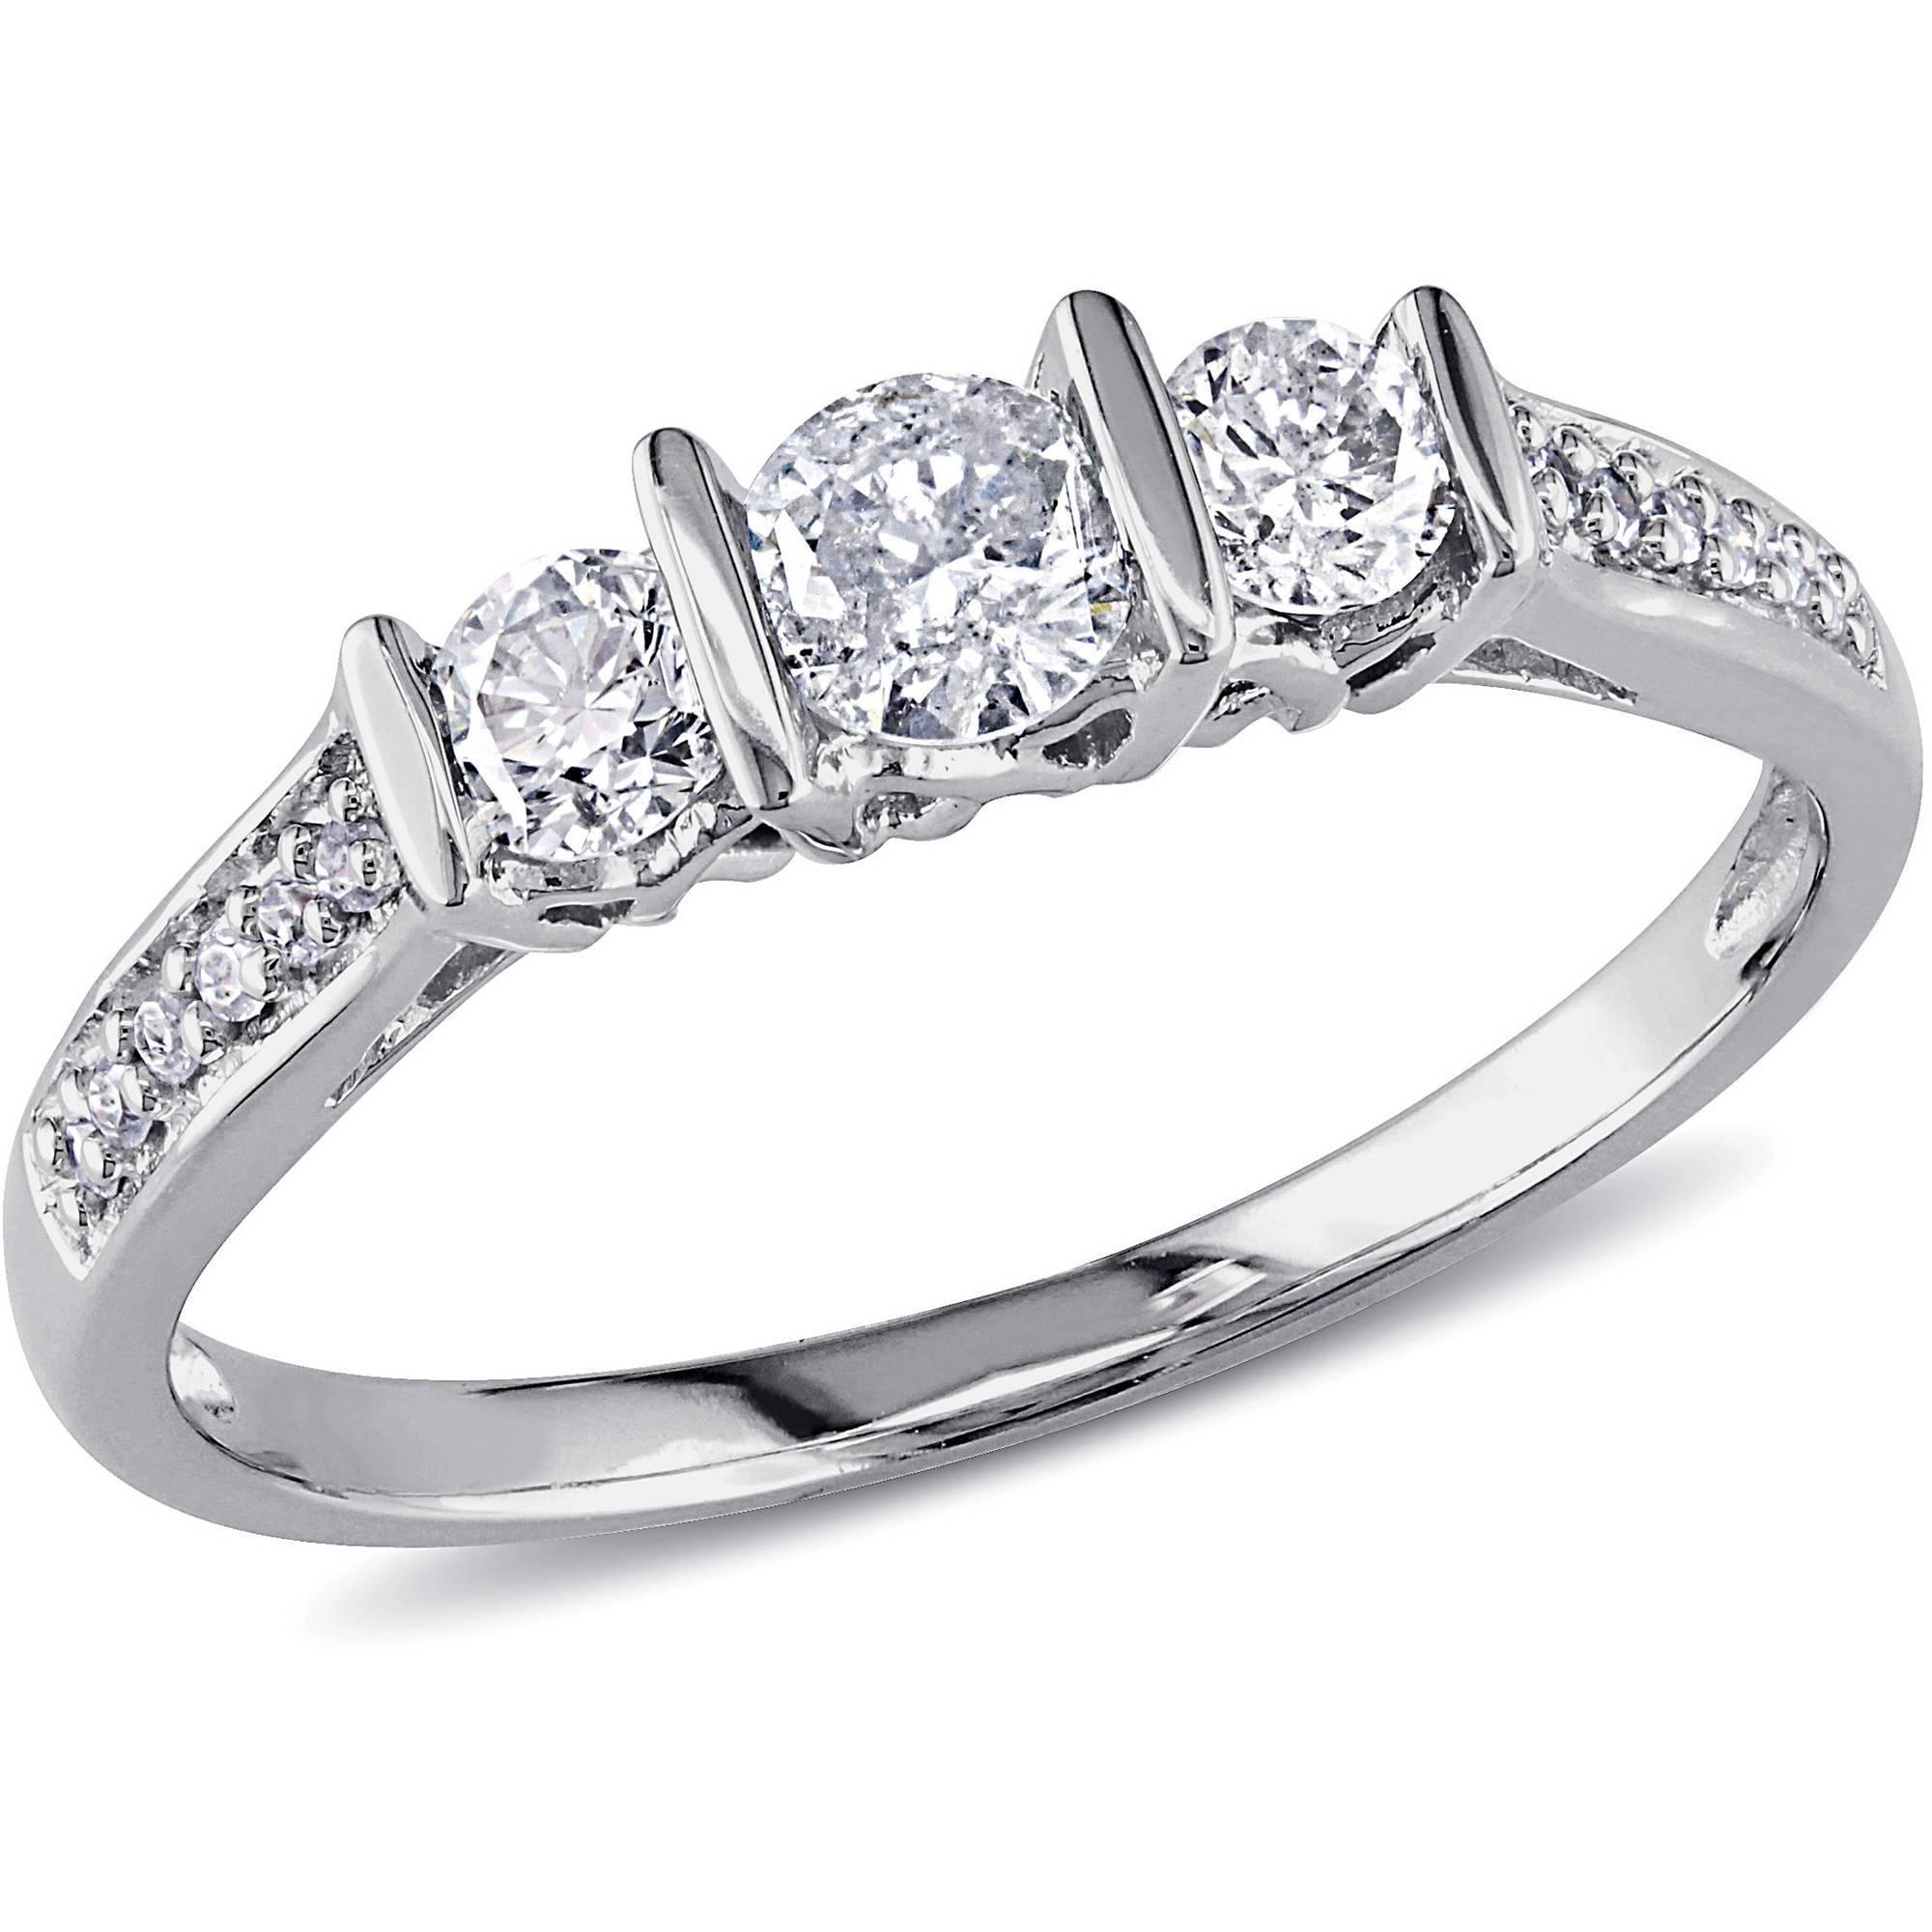 Keepsake Diamond Rings With Regard To Walmart Mens Engagement Rings (View 8 of 15)